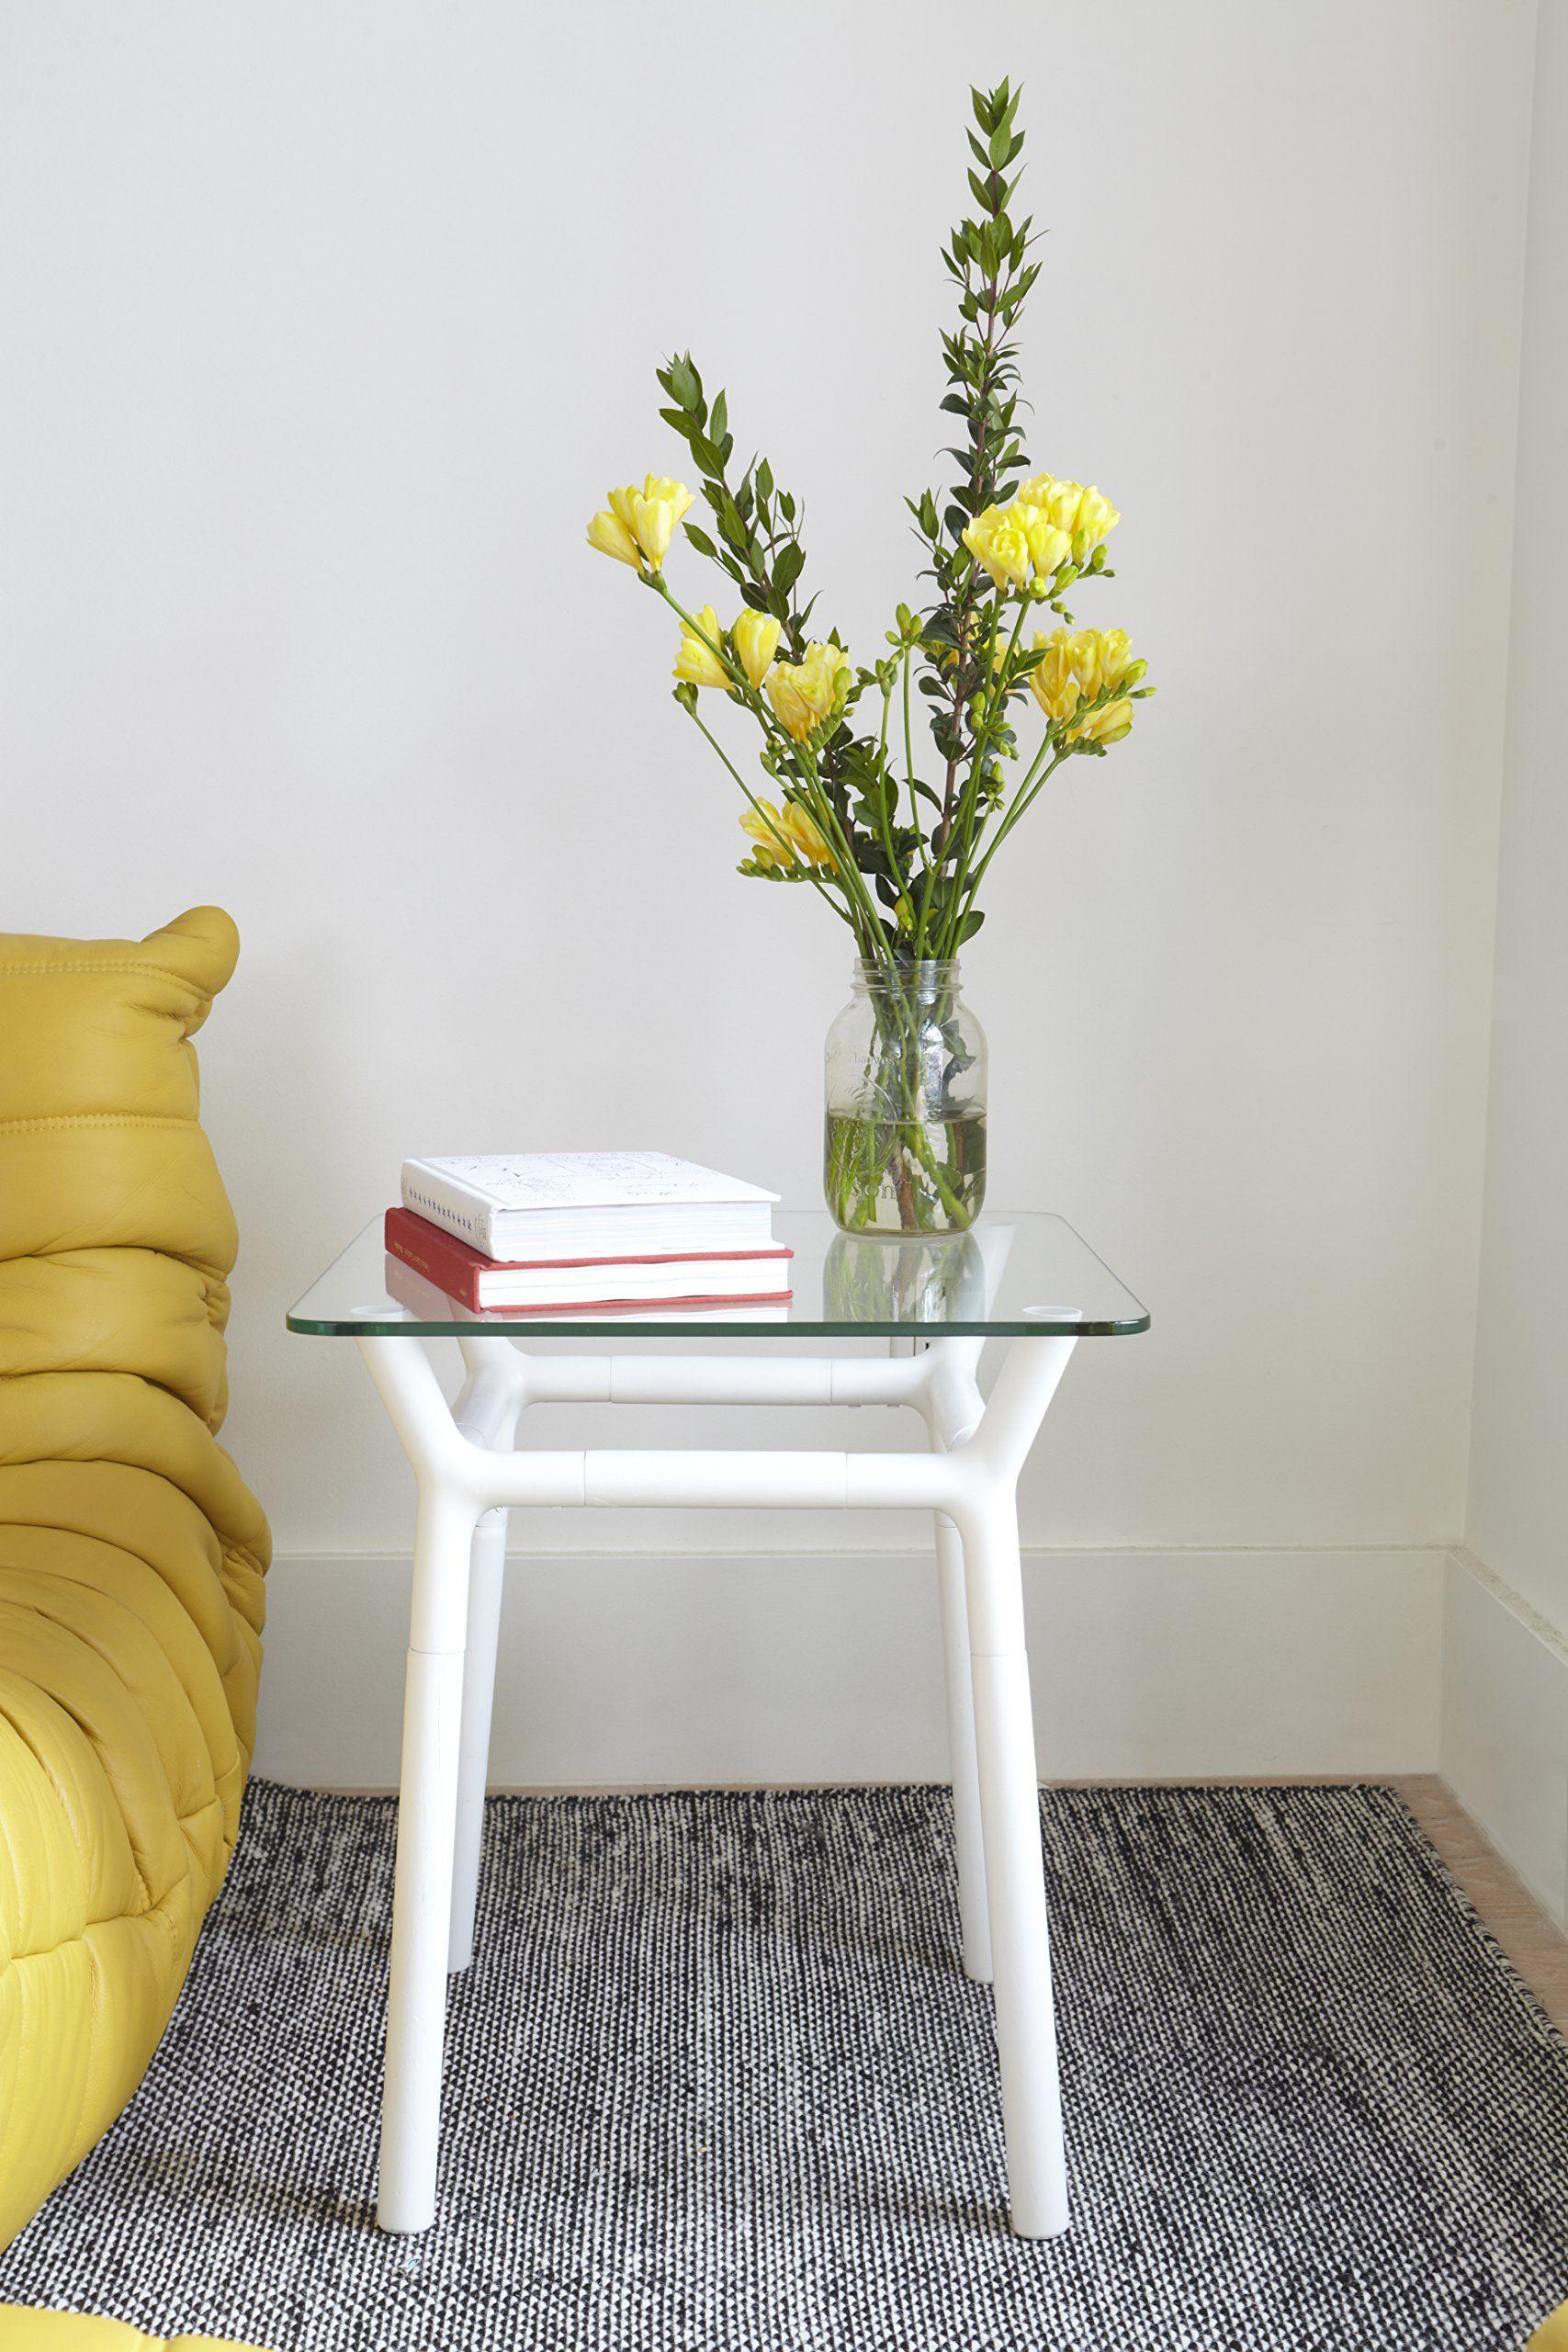 Amazon.com - Umbra Konnect Glass-Top Side Table, White -